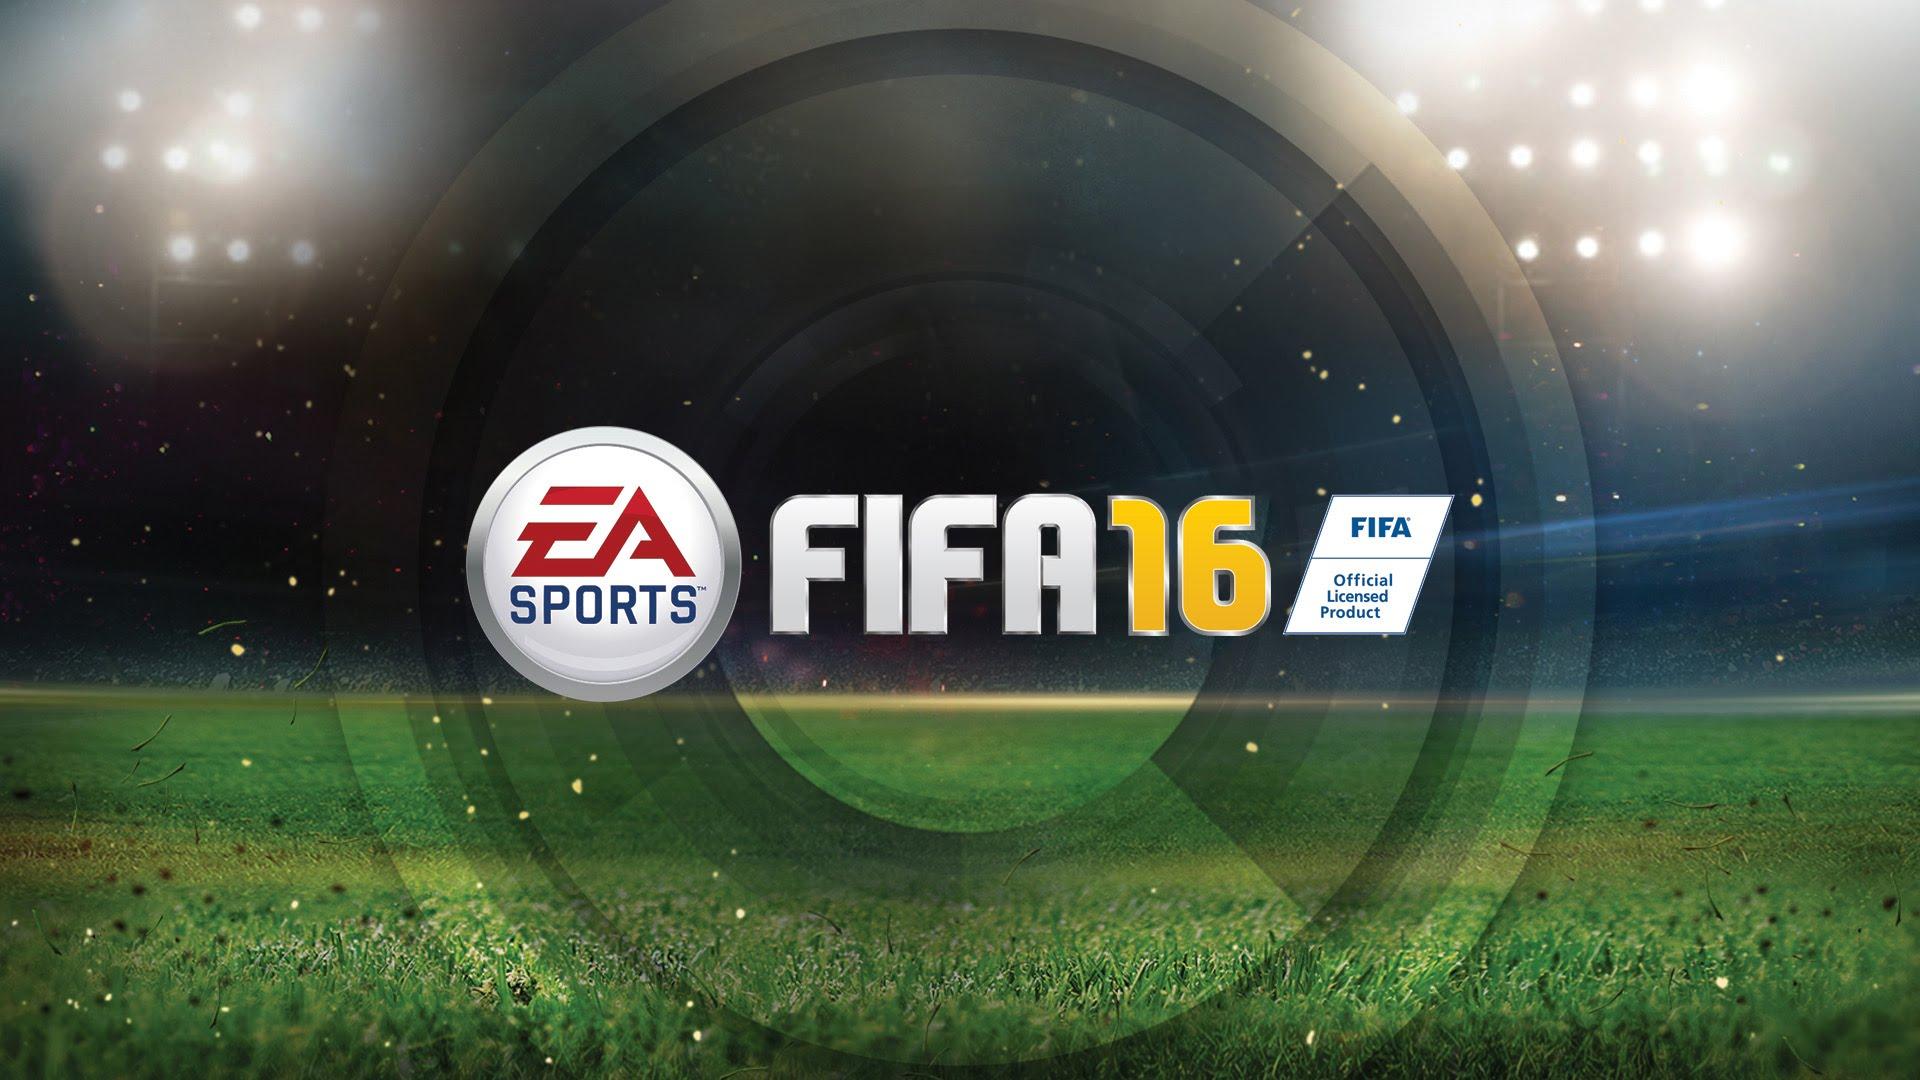 fifa-16-new.jpg-3e78f6